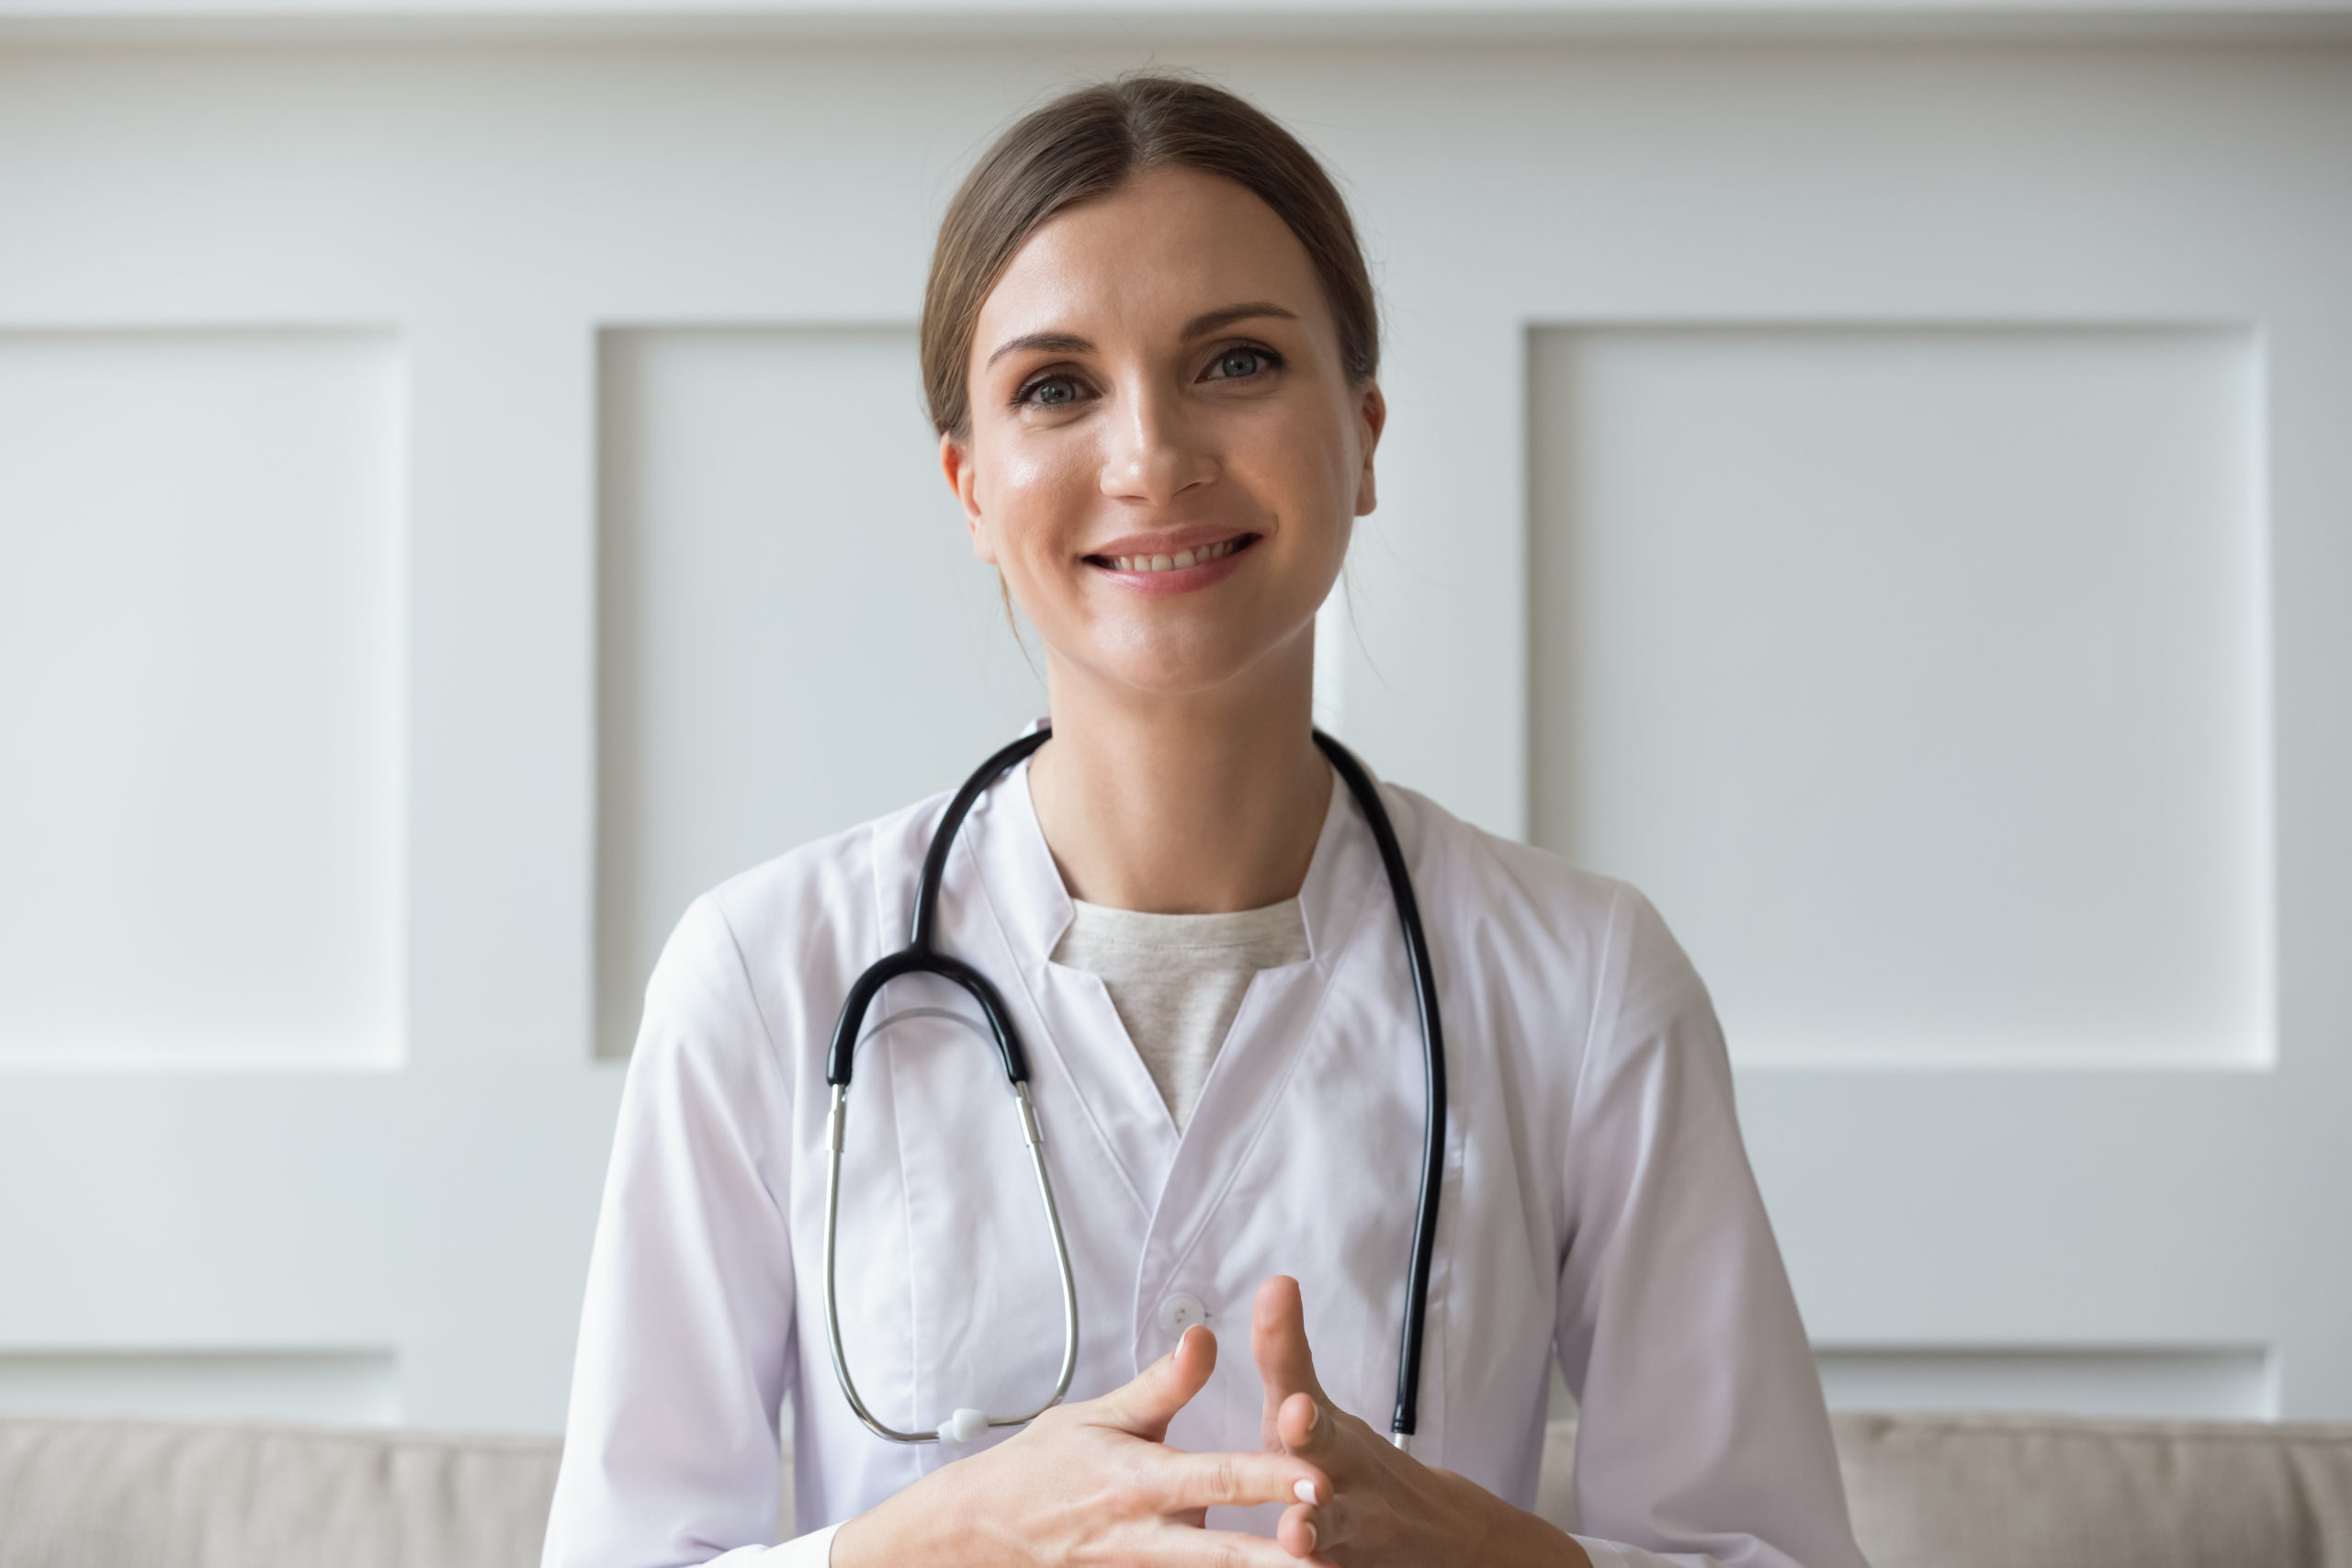 Wywiad lekarski - die Anamnese